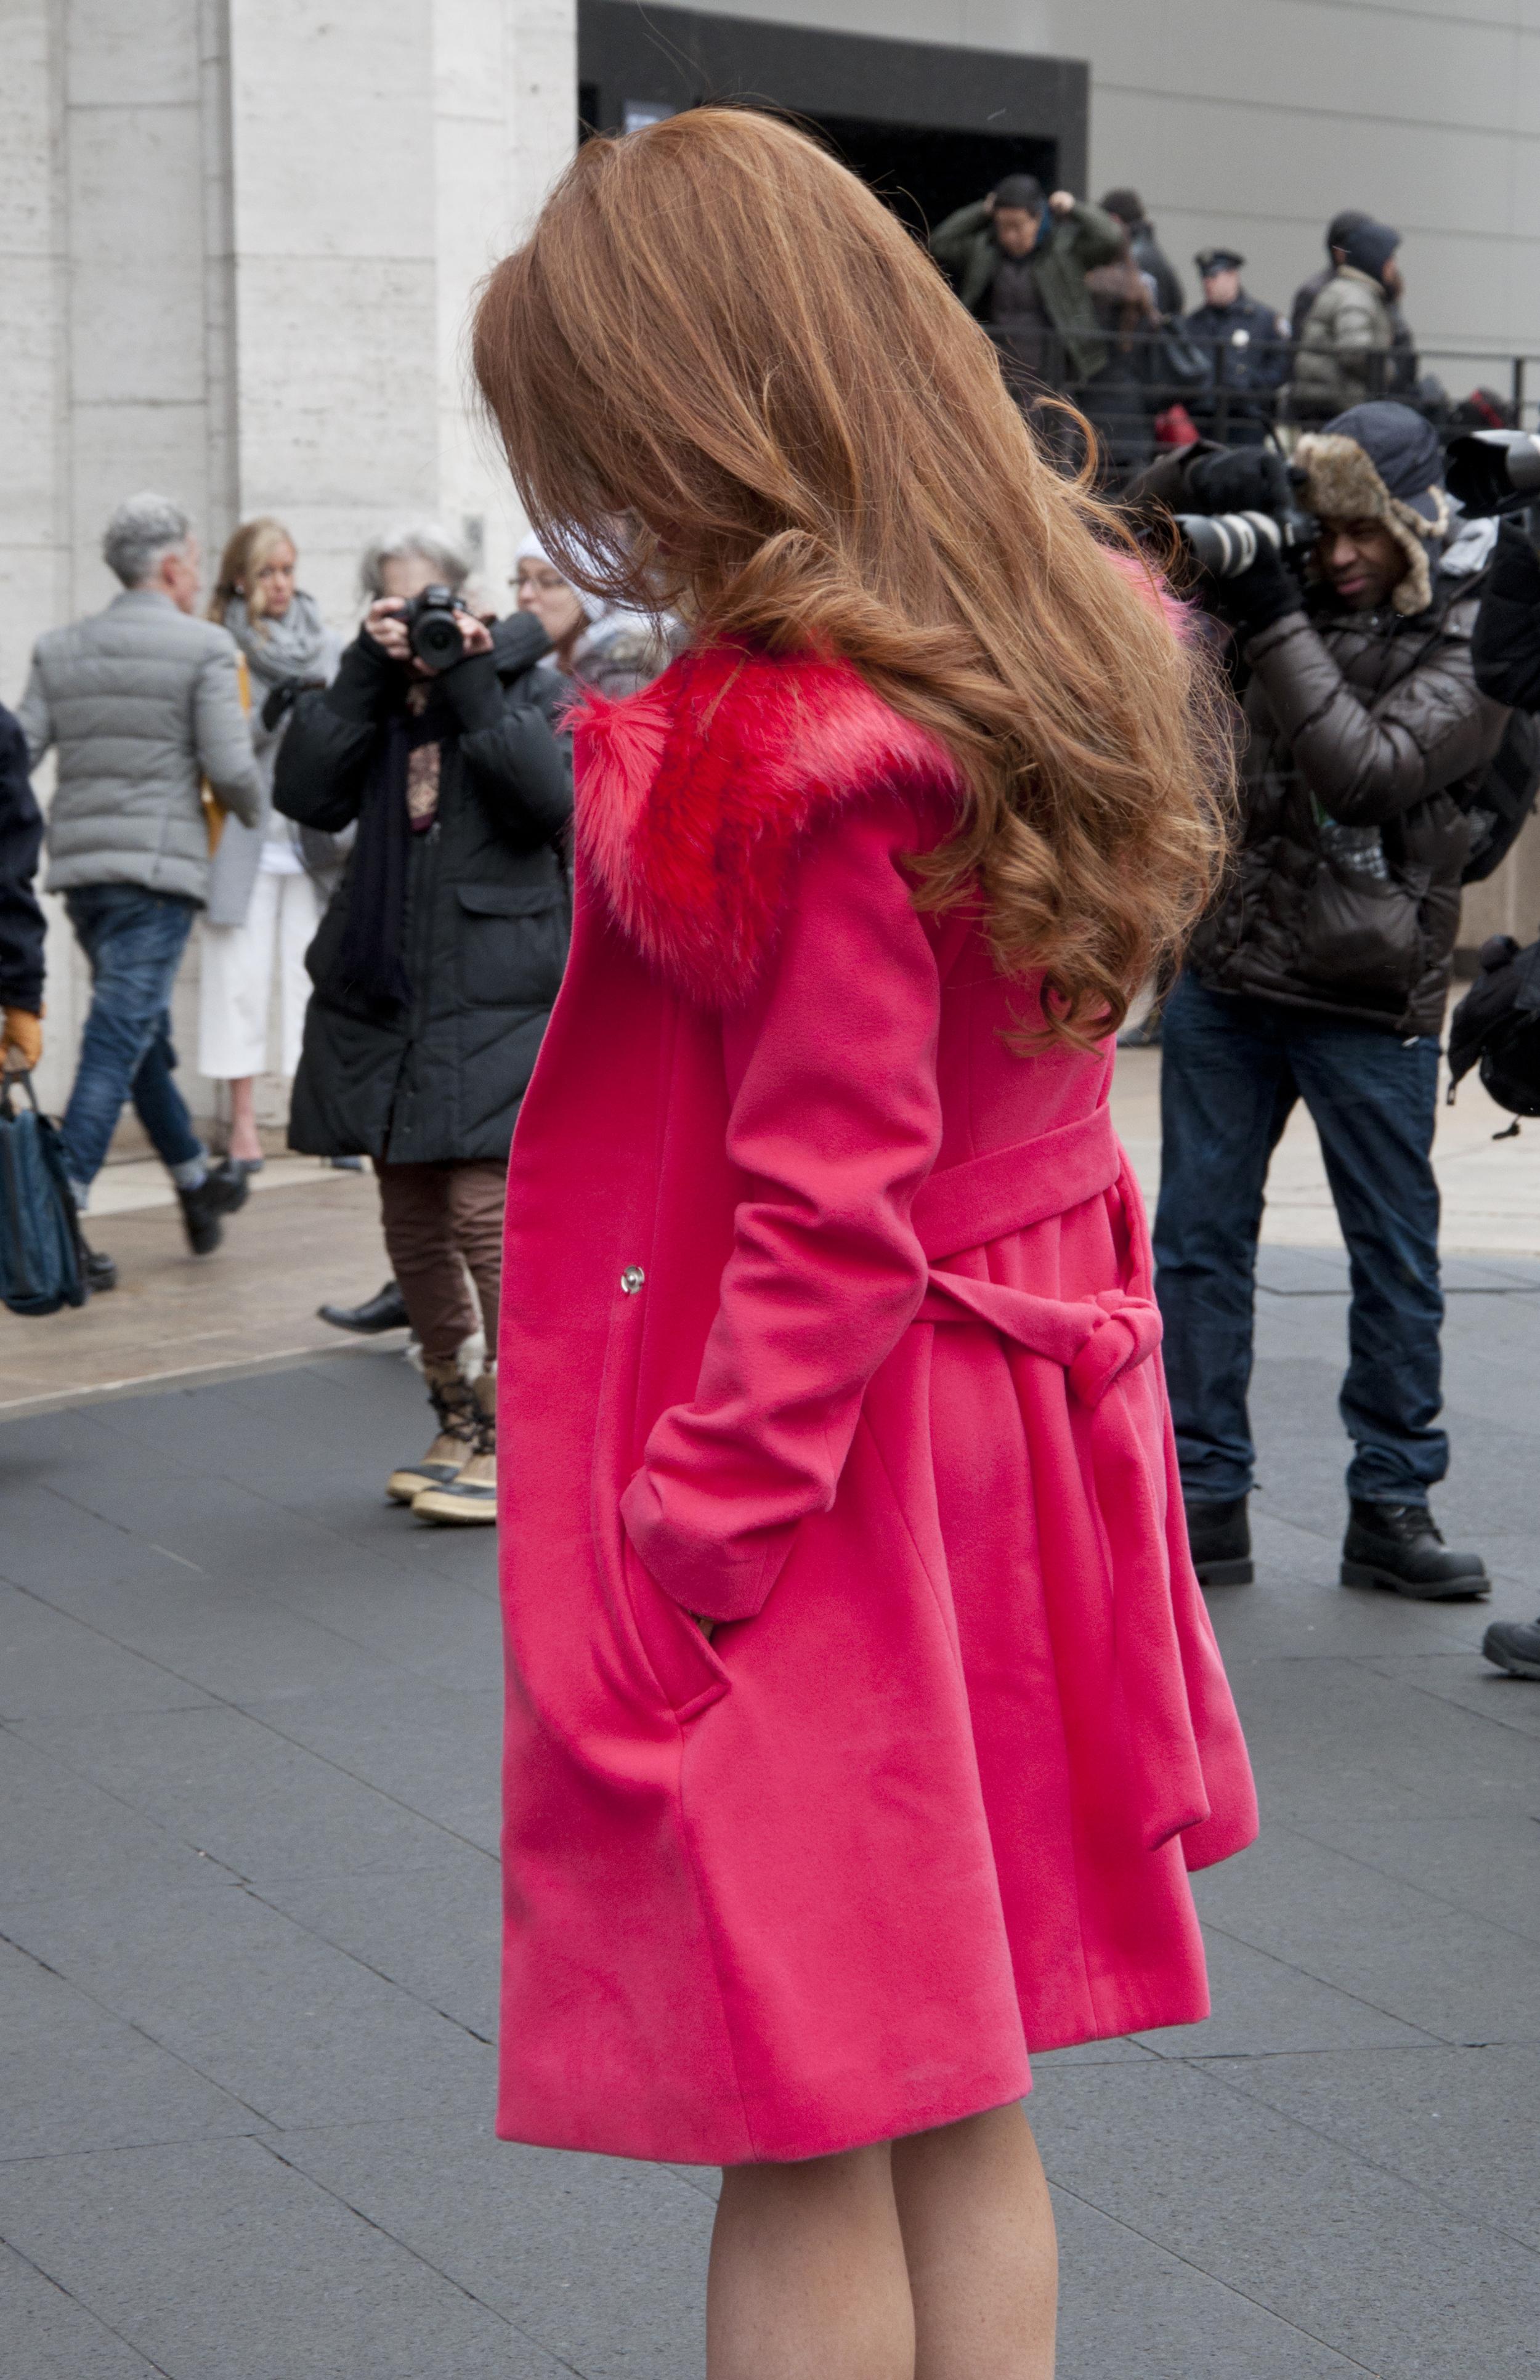 is her hair perf, or is her hair perf?